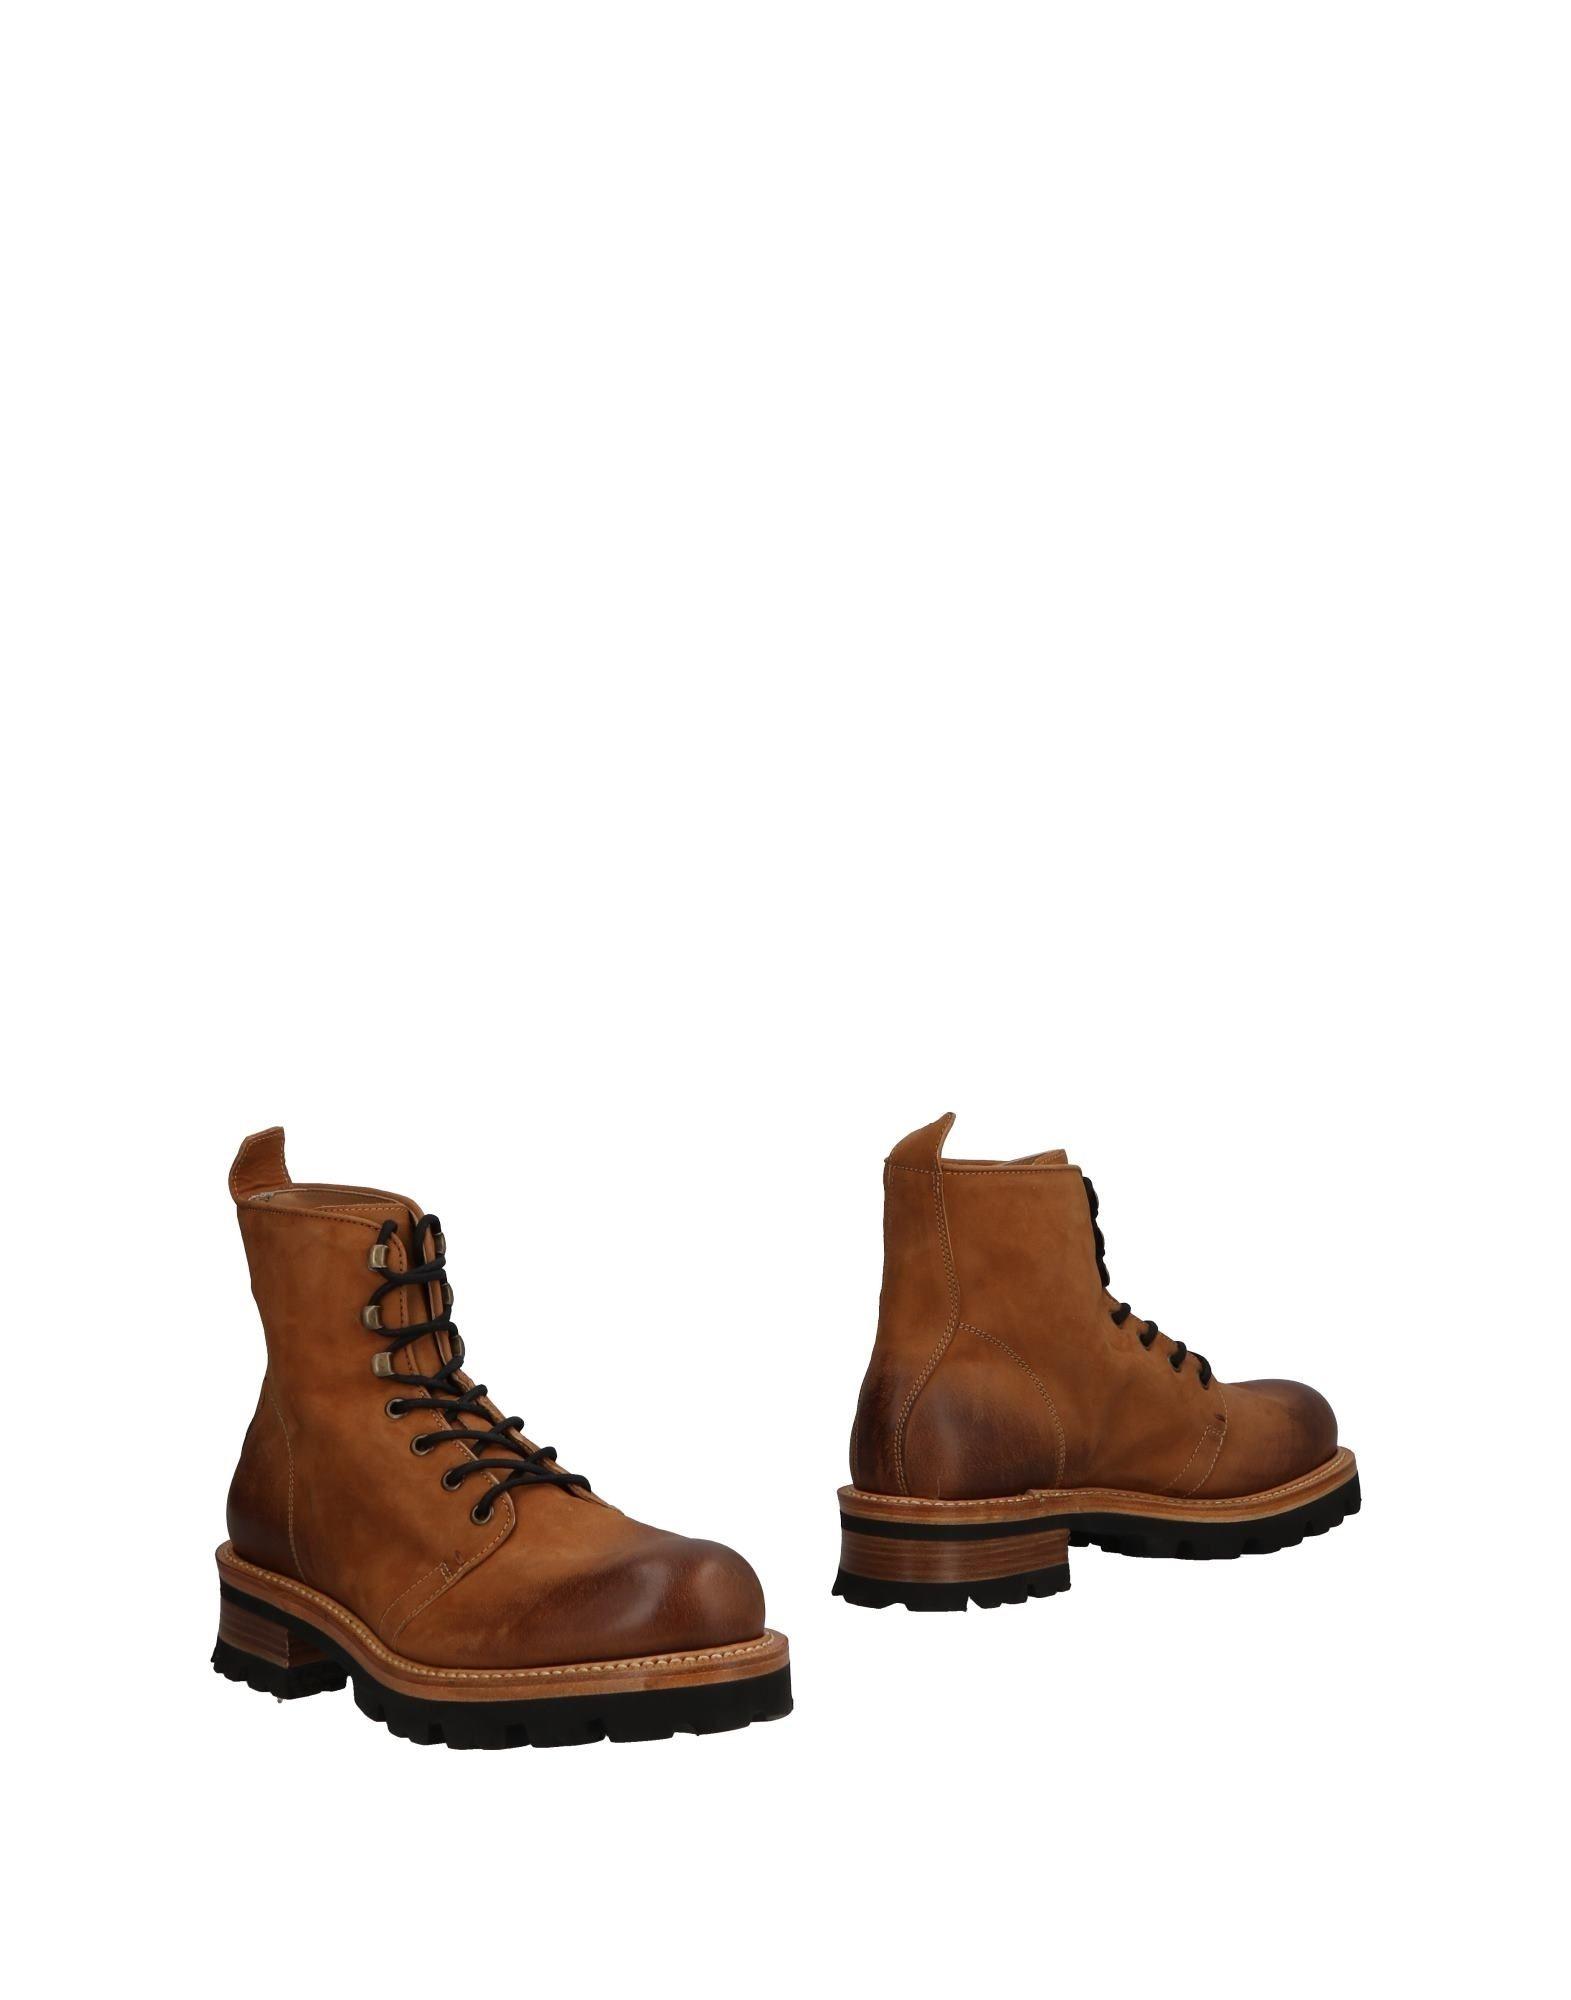 CAPPELLETTI Boots in Tan